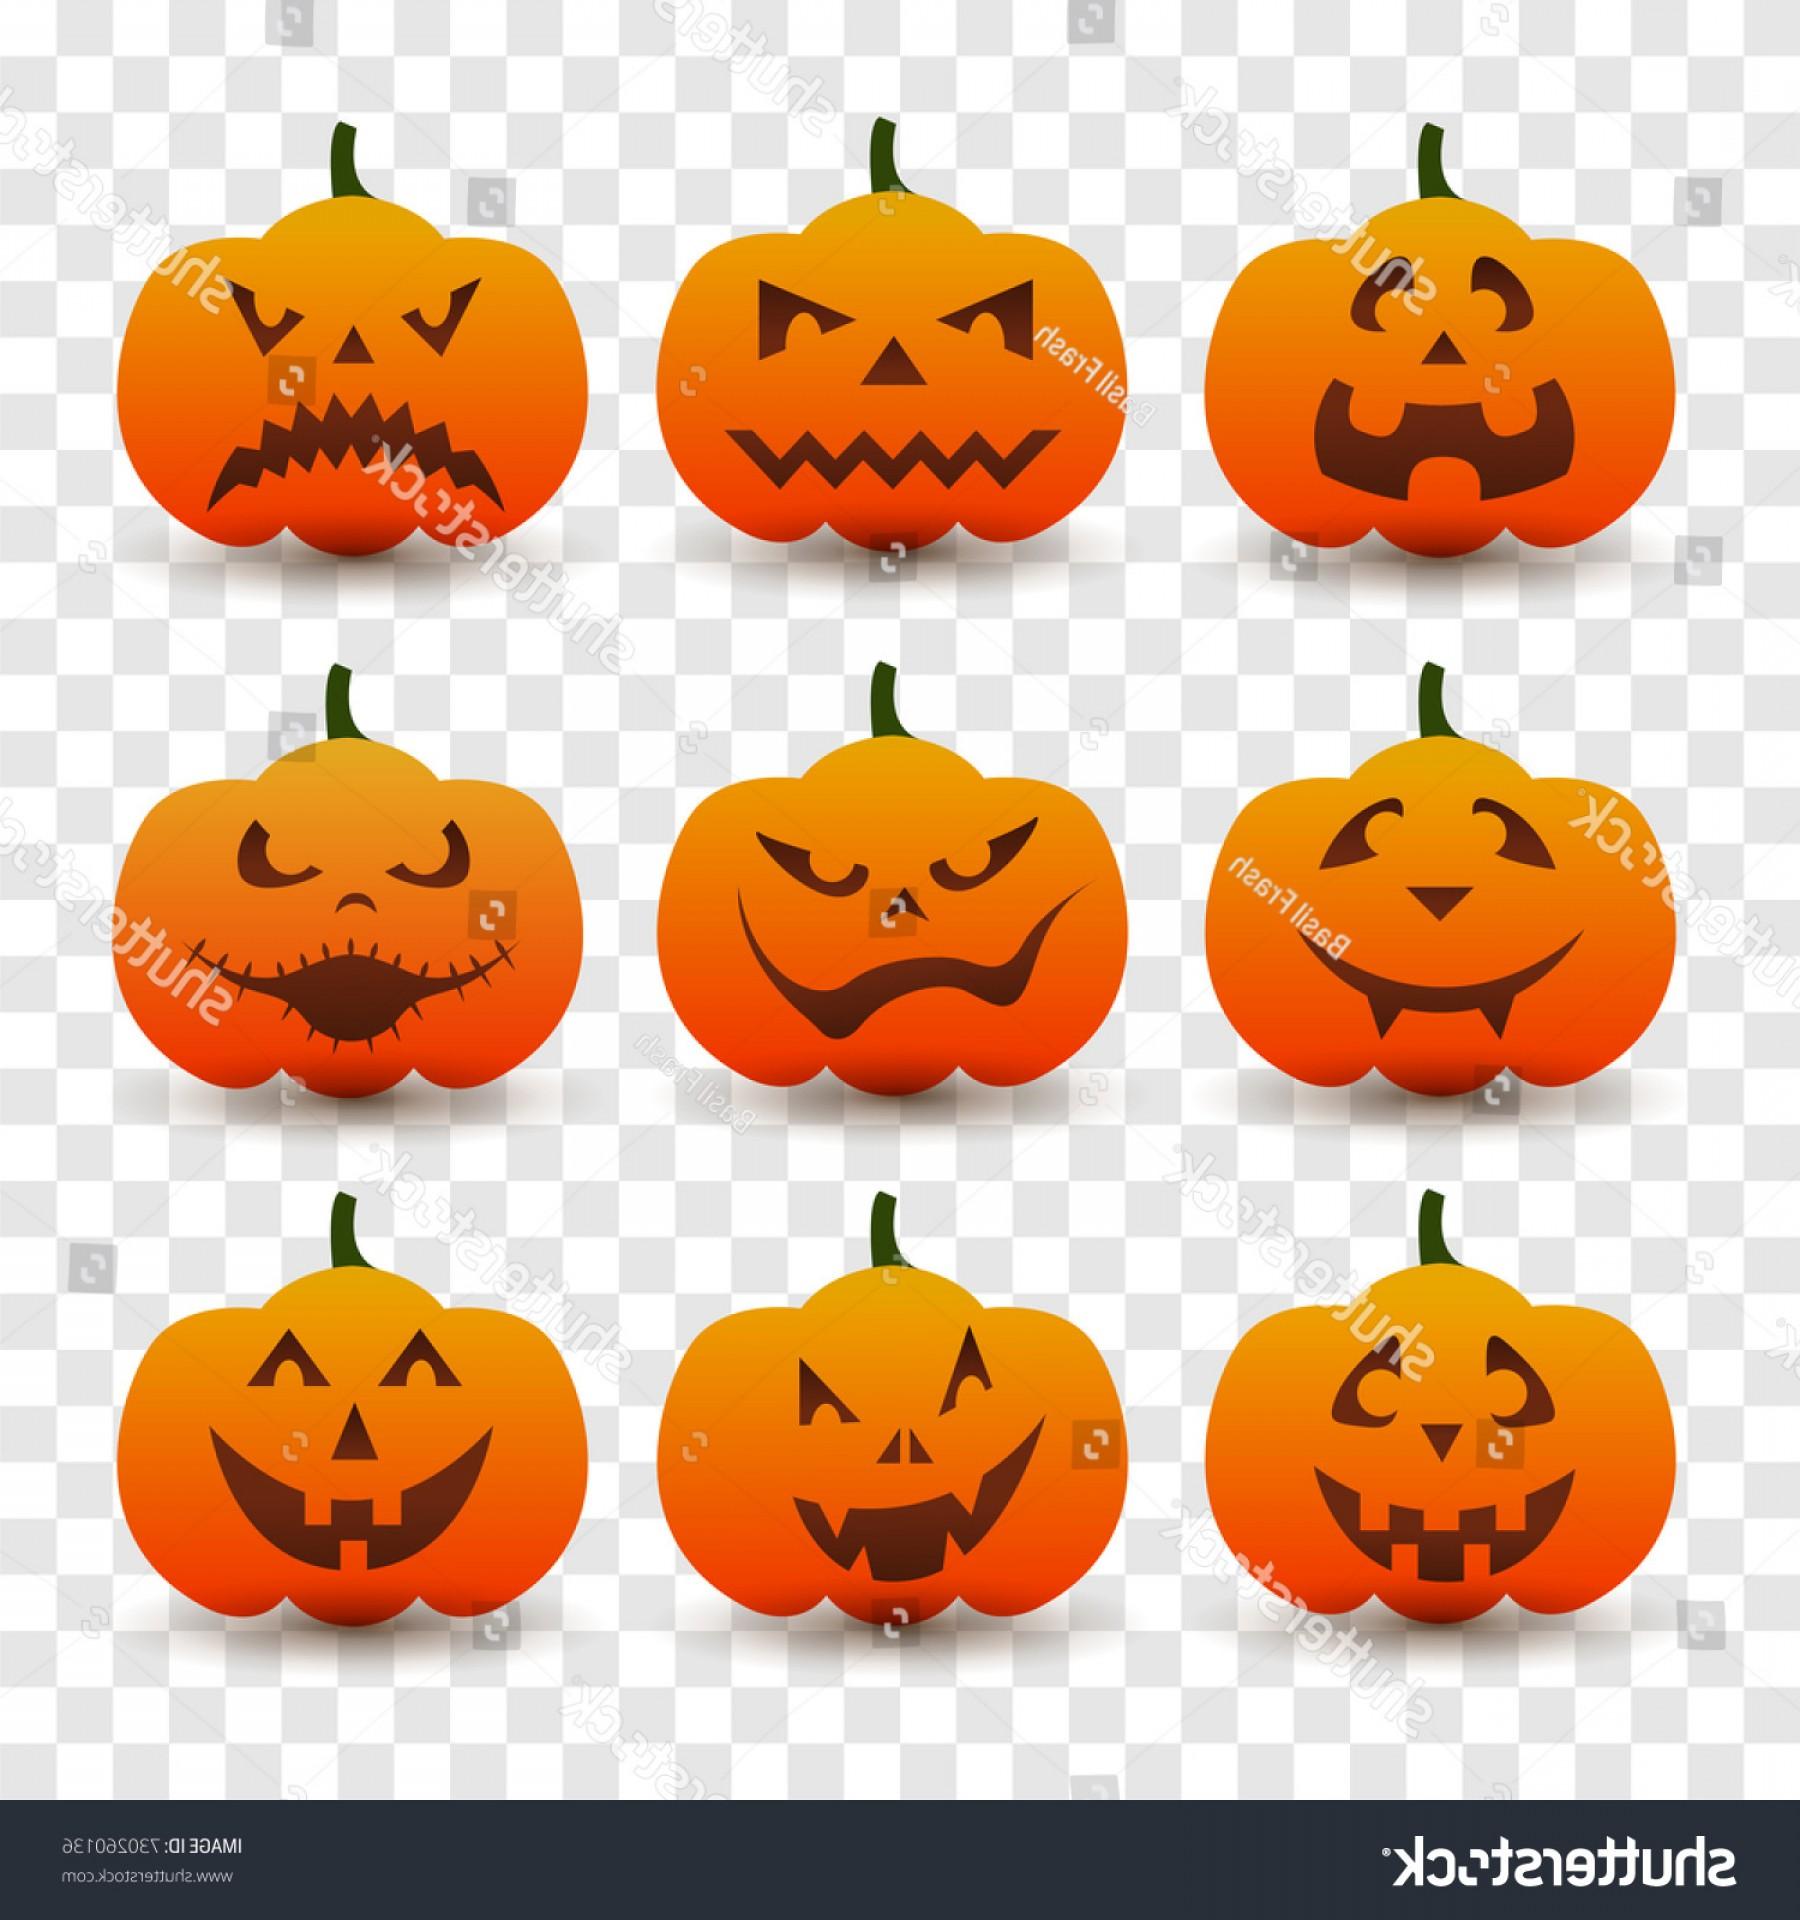 Halloween Pumpkin Vector.Pumpkin Vector Clipart At Getdrawings Com Free For Personal Use